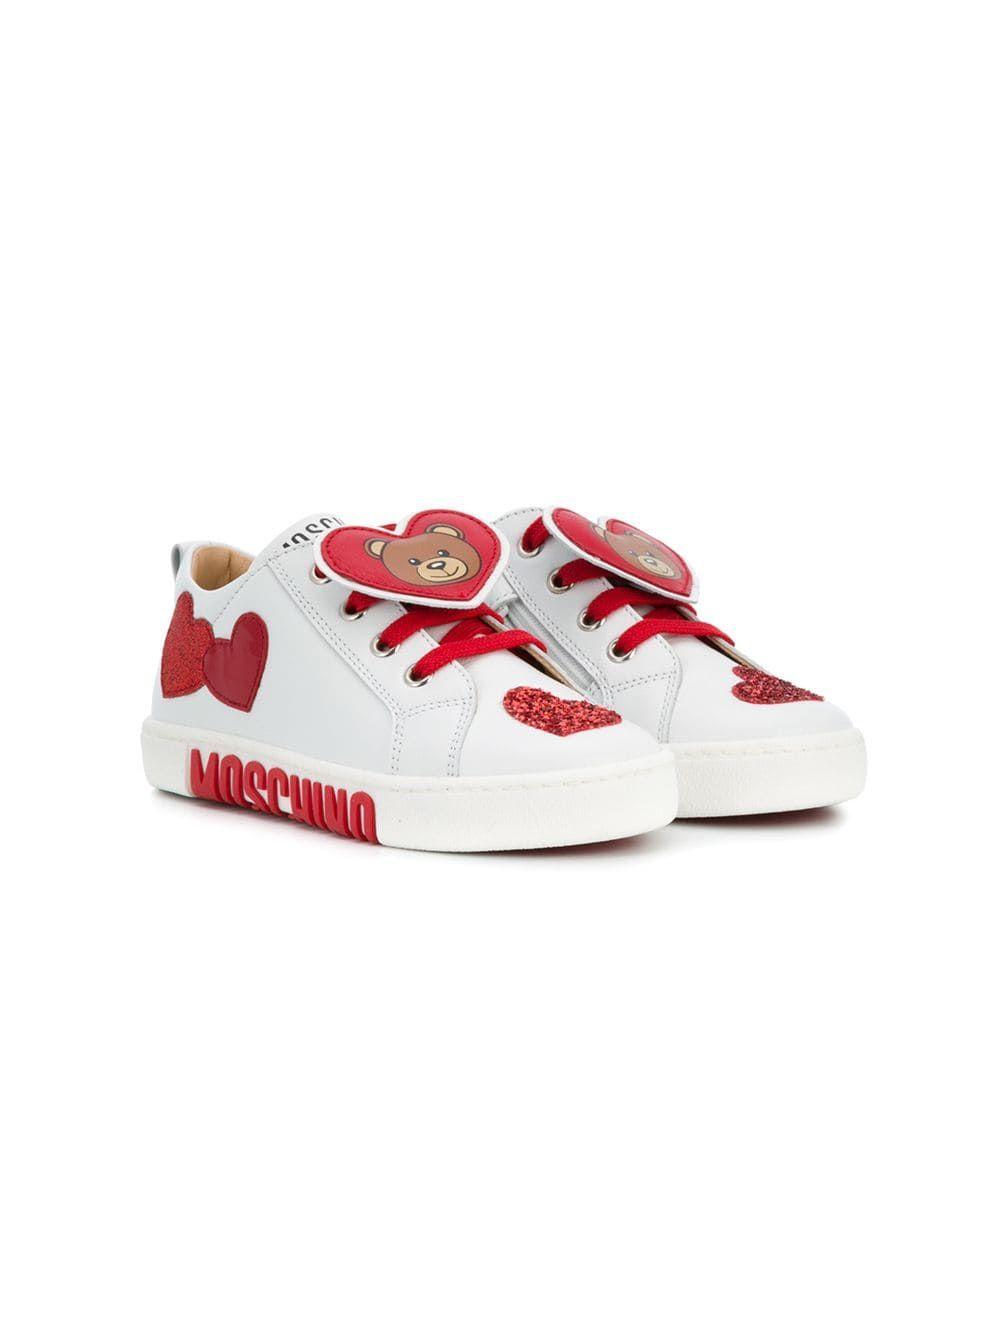 ddd9b558c0d0e Moschino Kids teddy heart sneakers - White on Avoir Fashion ...